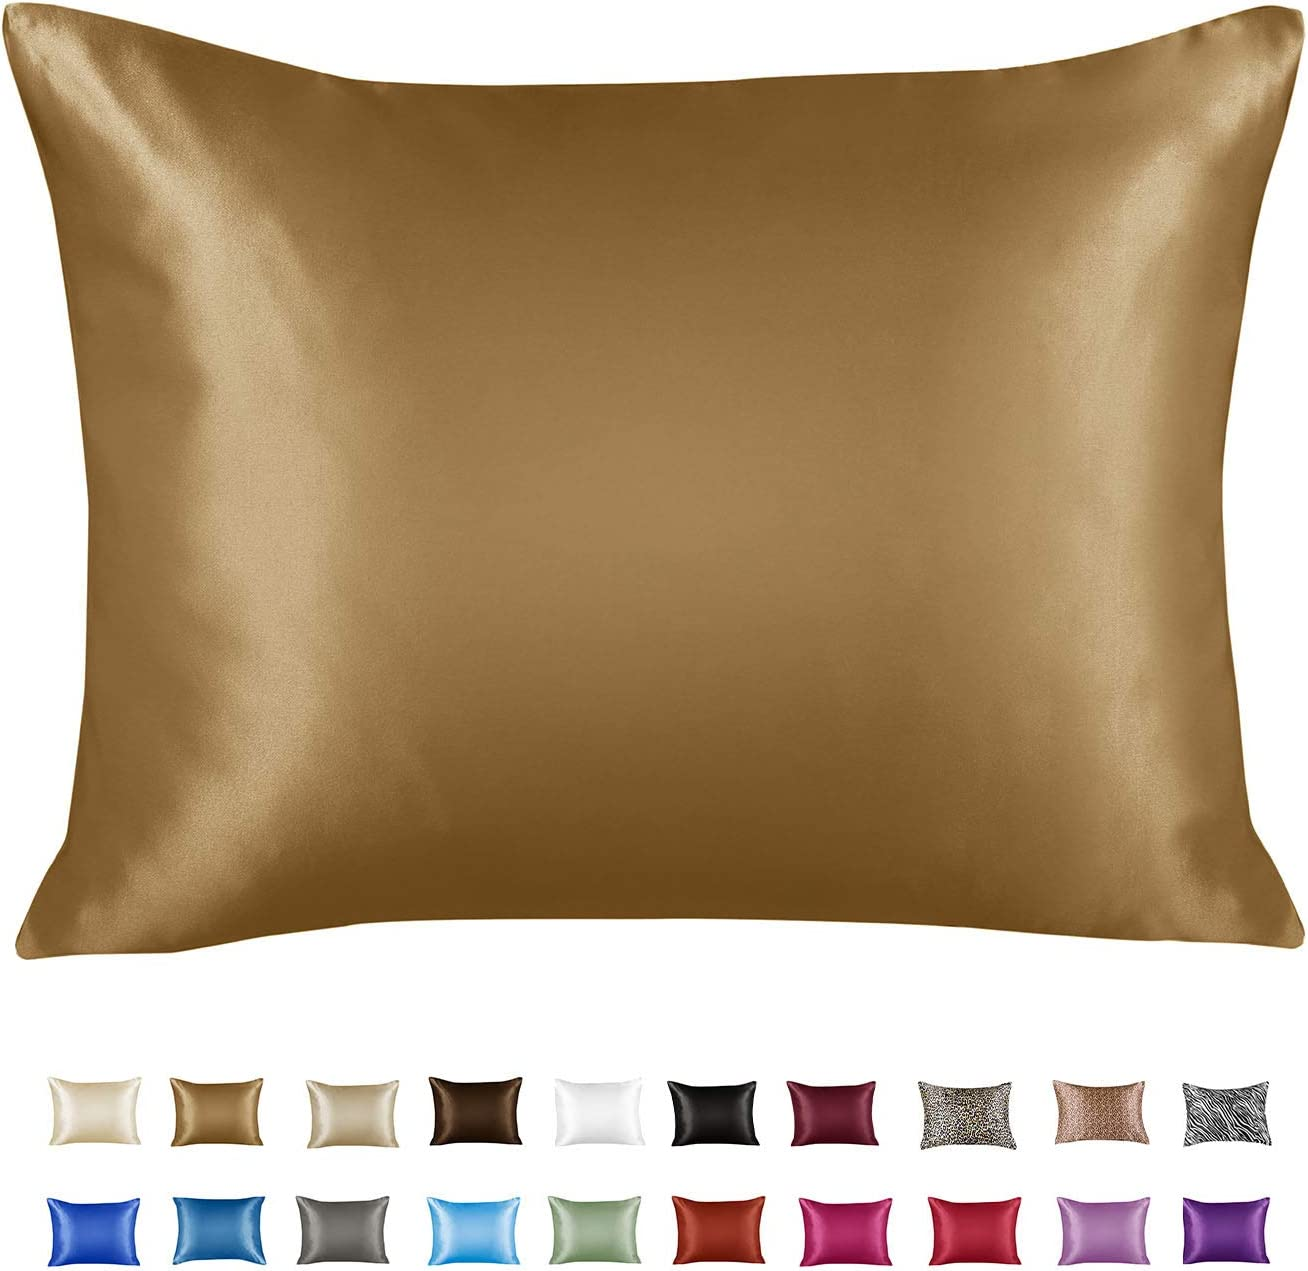 Shop Bedding Luxury Satin Pillowcase for Hair – Standard Satin Pillowcase with Zipper, Gold (1 per Pack) – Blissford